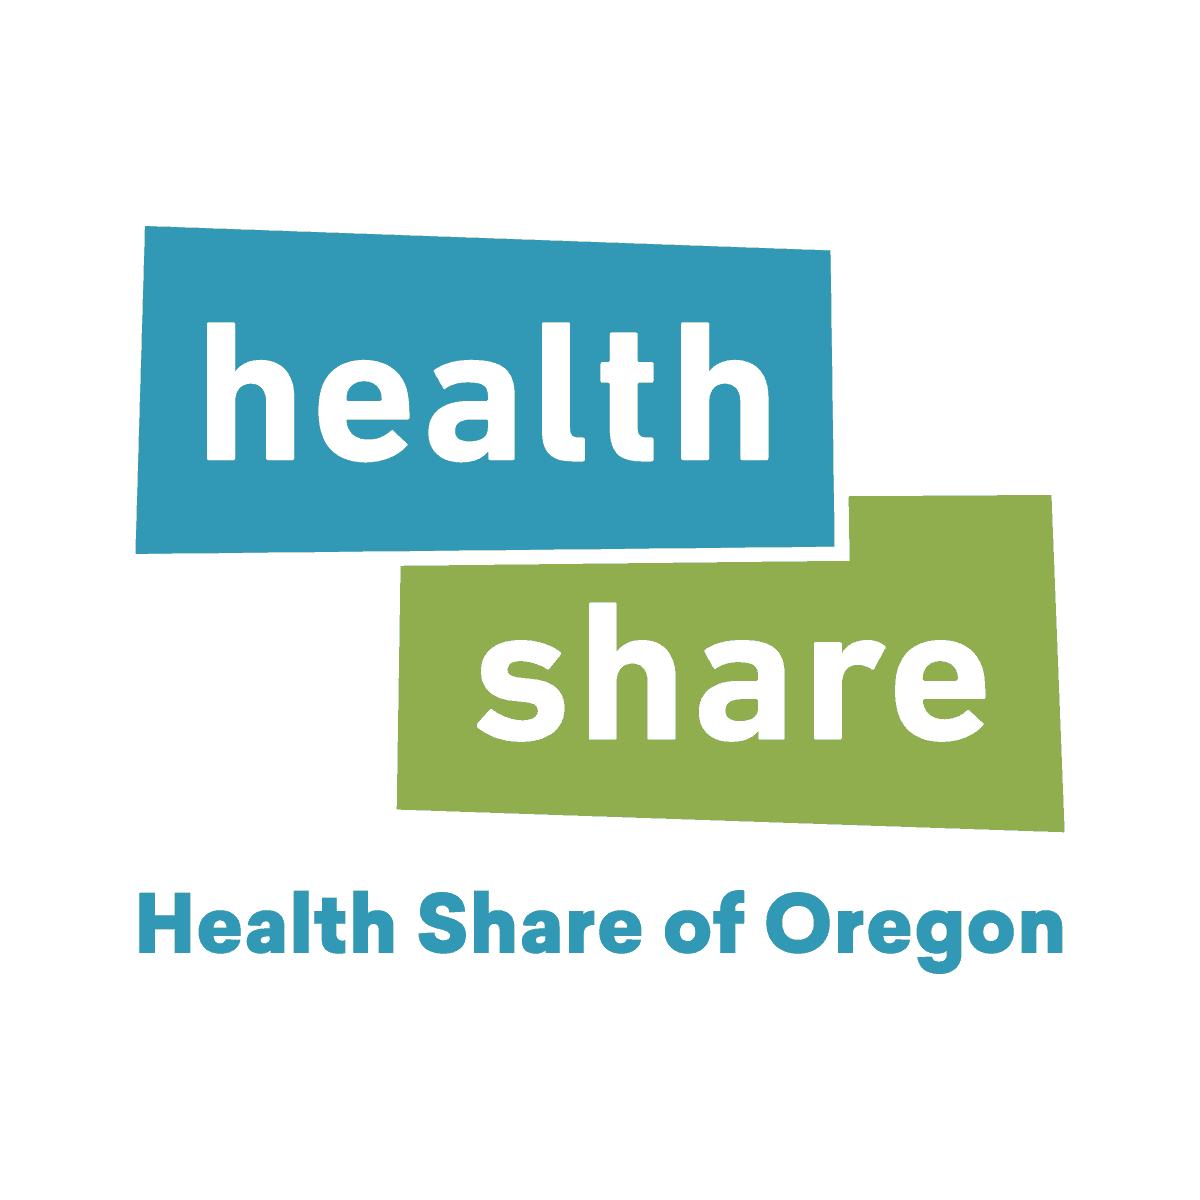 Health Share